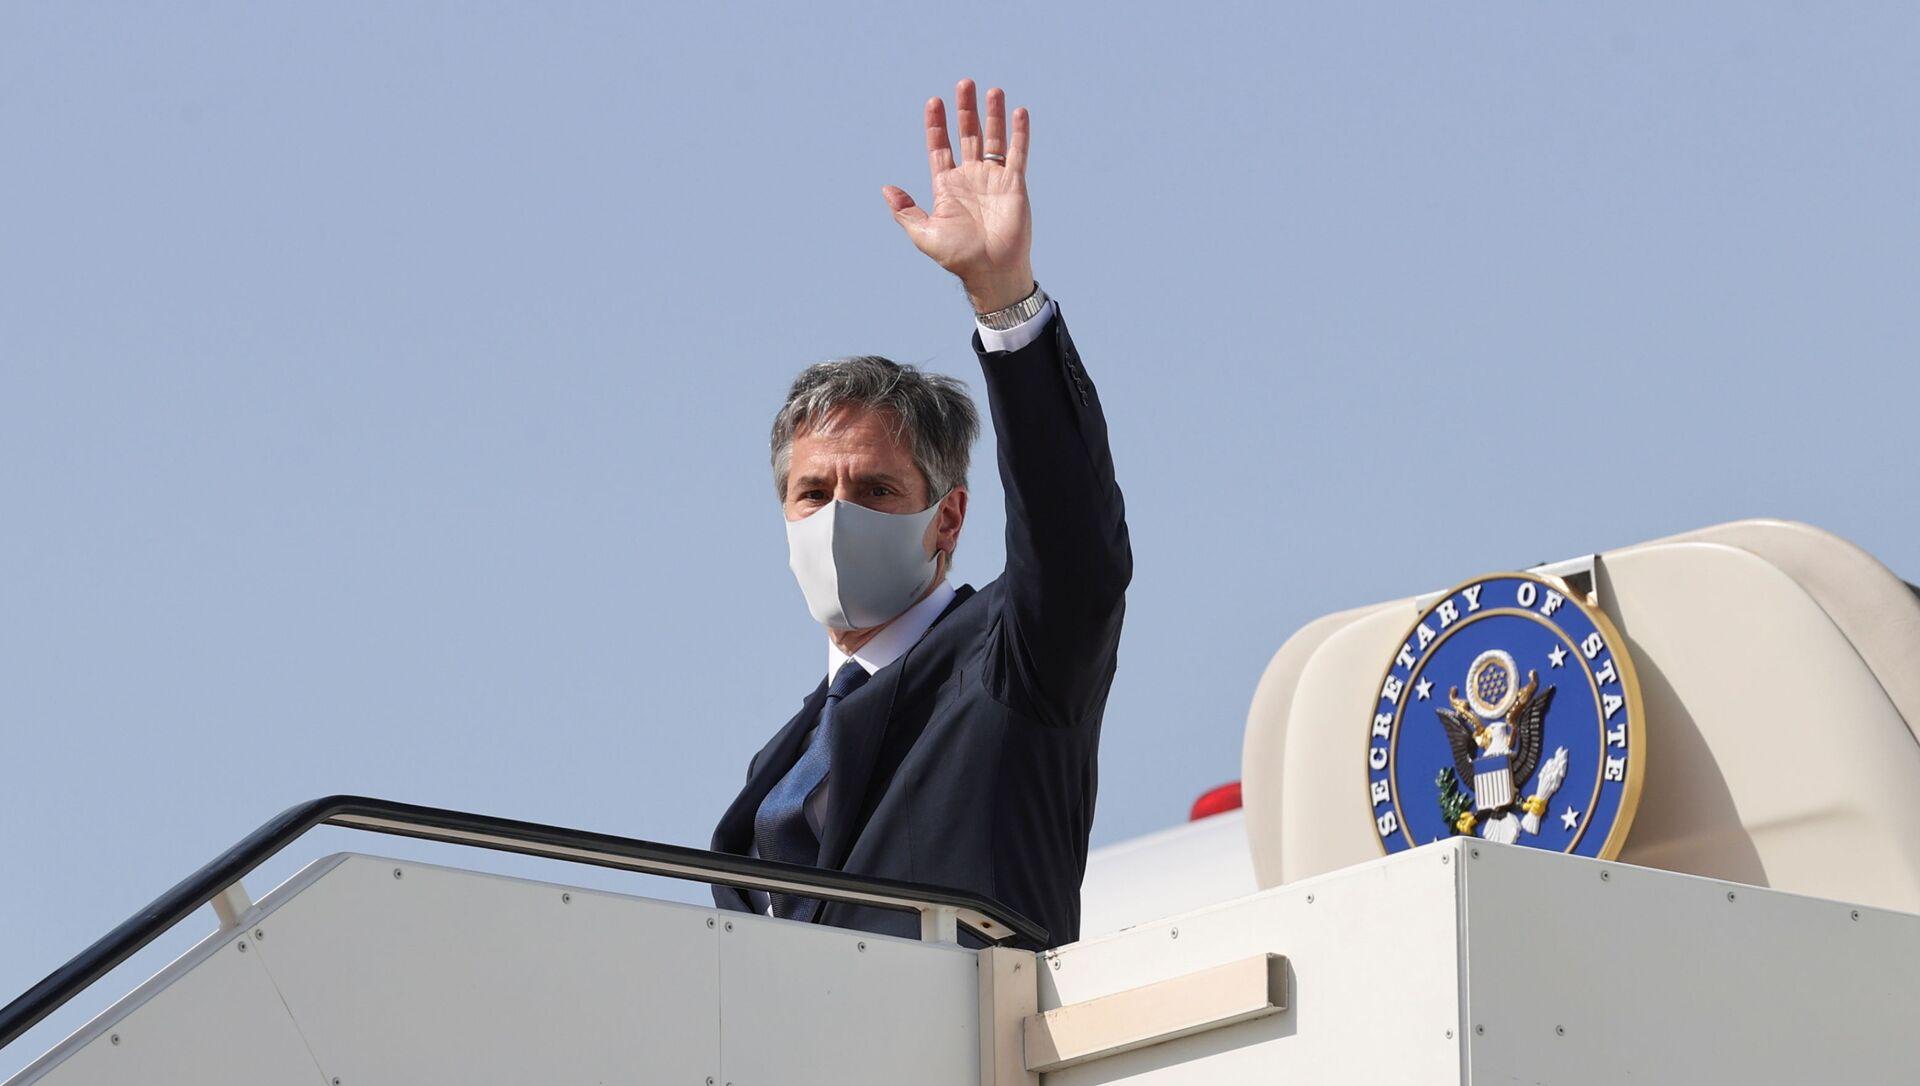 U.S. Secretary of State Antony Blinken boards his plane to depart for his return to the United States from Kuwait International Airport in Kuwait City, Kuwait, July 29, 2021 - Sputnik International, 1920, 01.08.2021